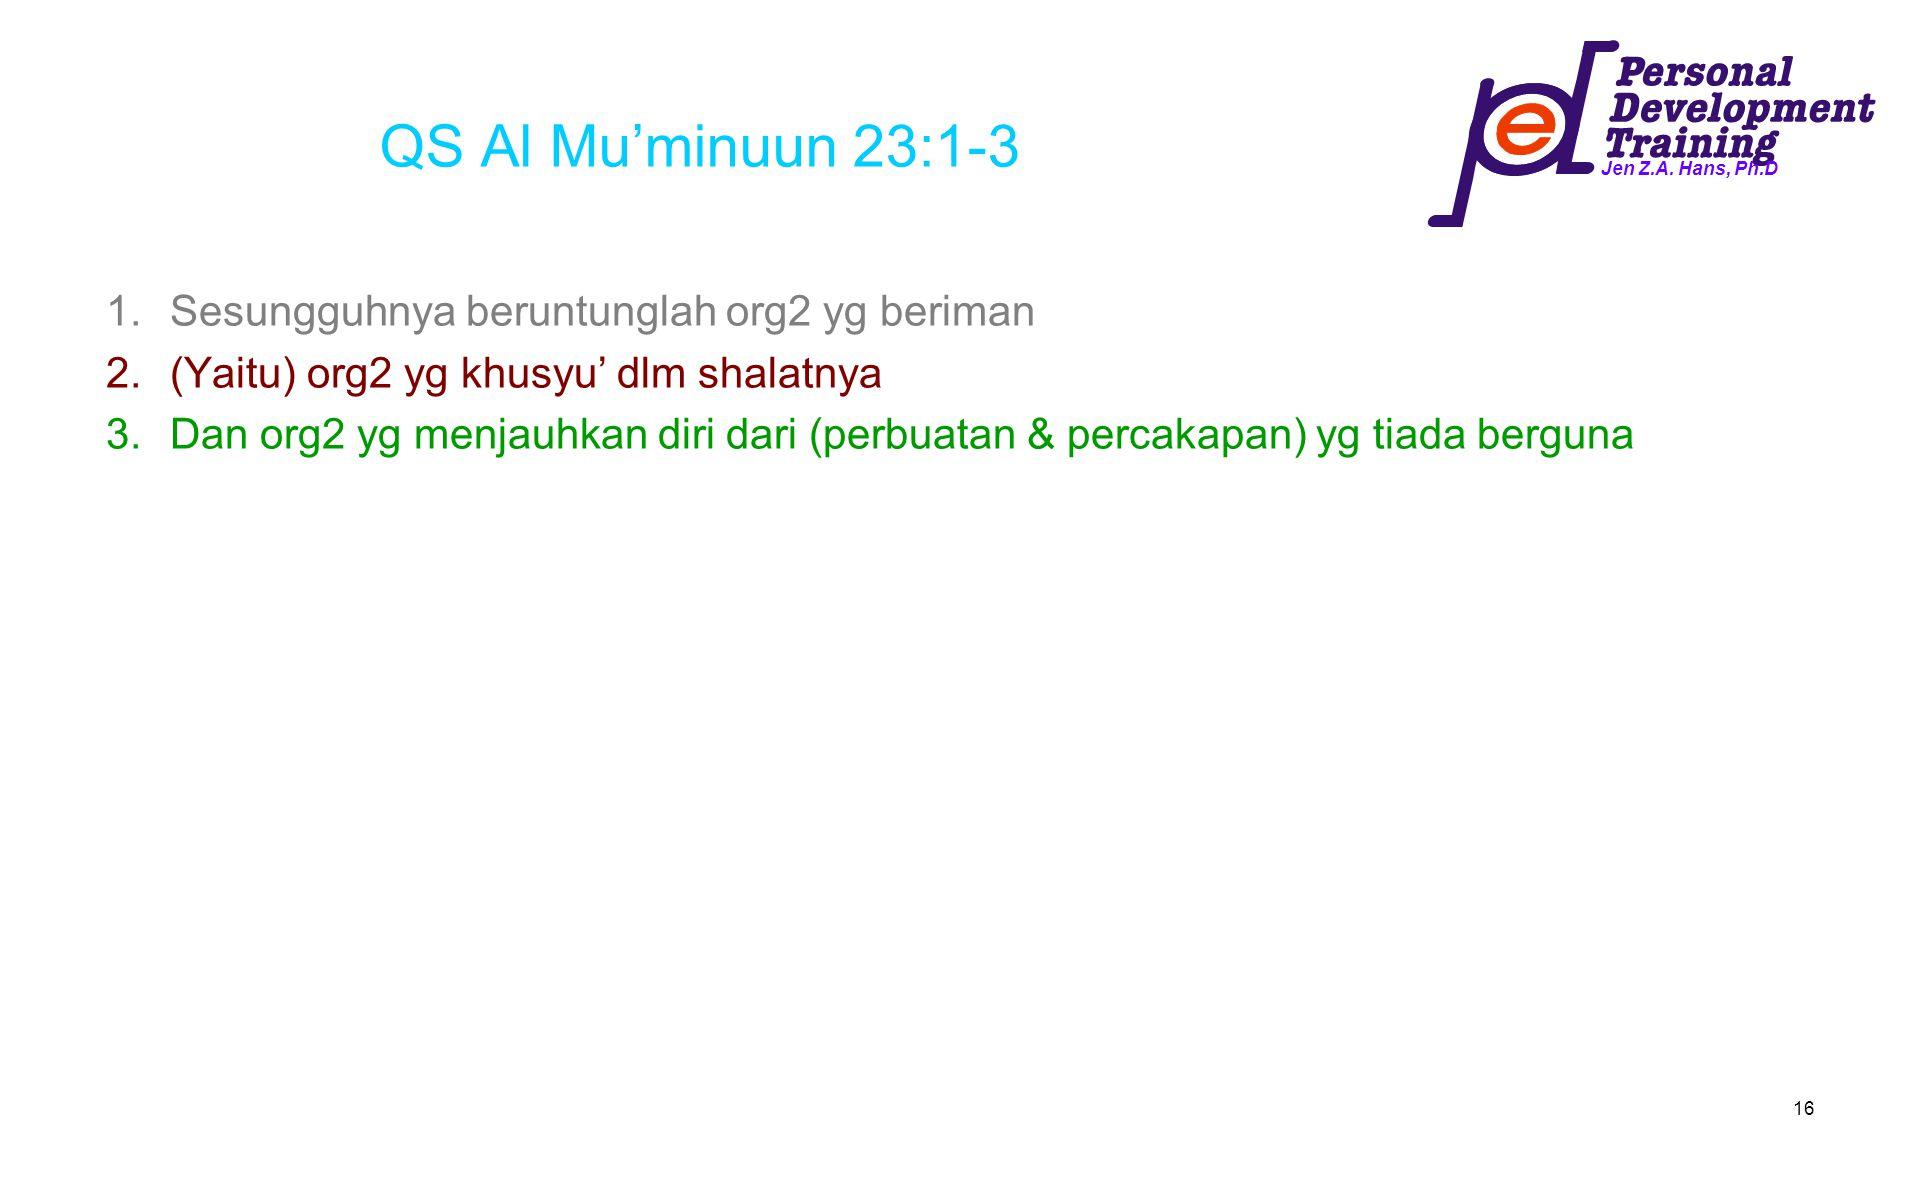 Jen Z.A. Hans, Ph.D 16 QS Al Mu'minuun 23:1-3 1.Sesungguhnya beruntunglah org2 yg beriman 2.(Yaitu) org2 yg khusyu' dlm shalatnya 3.Dan org2 yg menjau